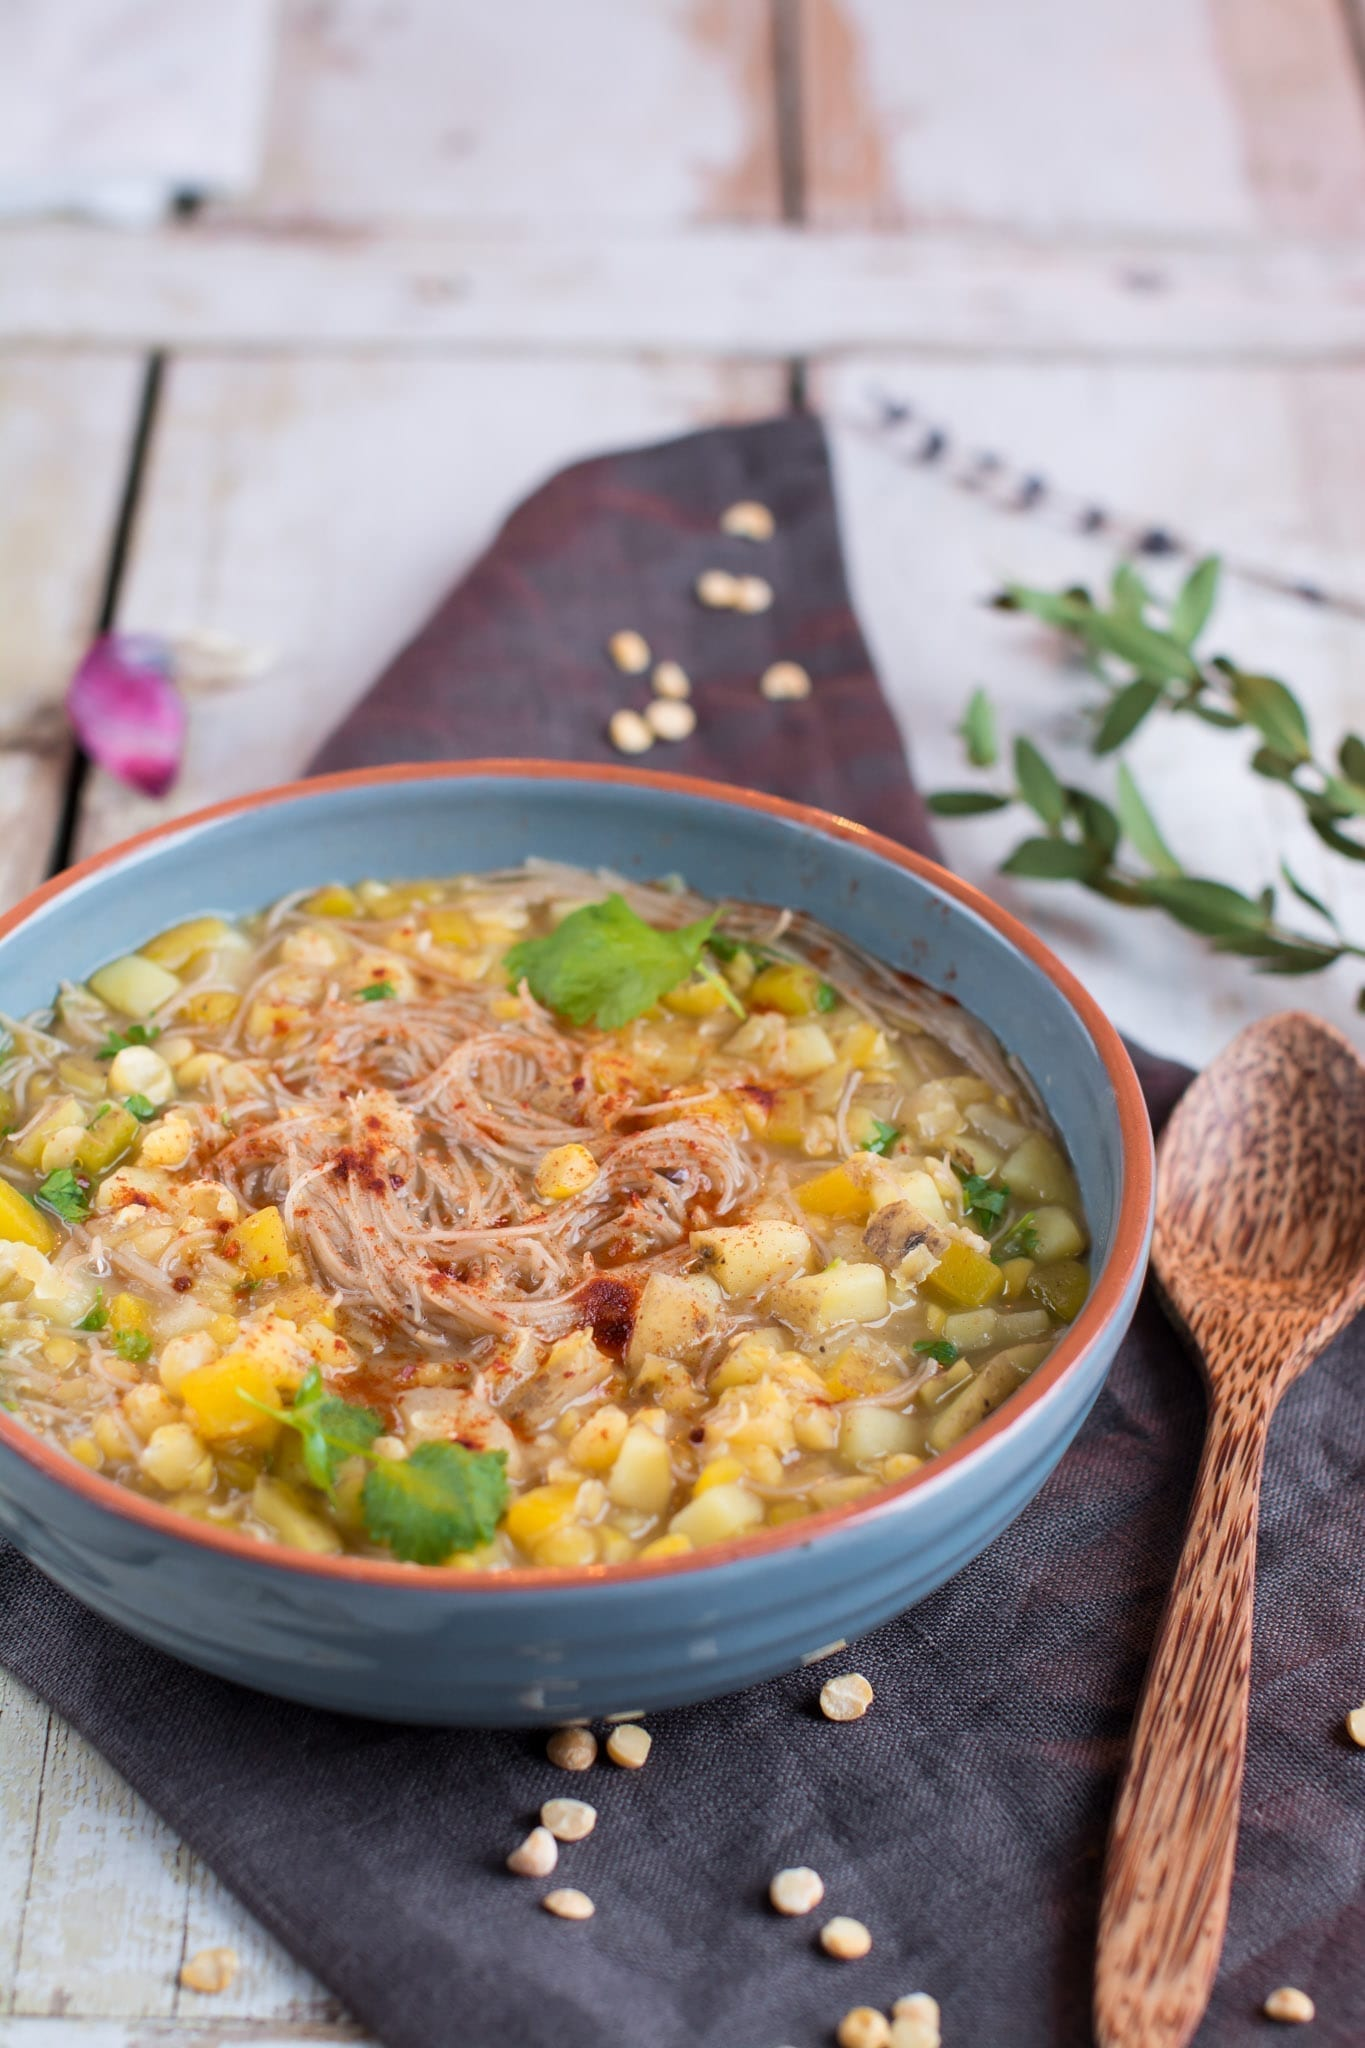 Smoky Split Pea Soup with Rice Noodles